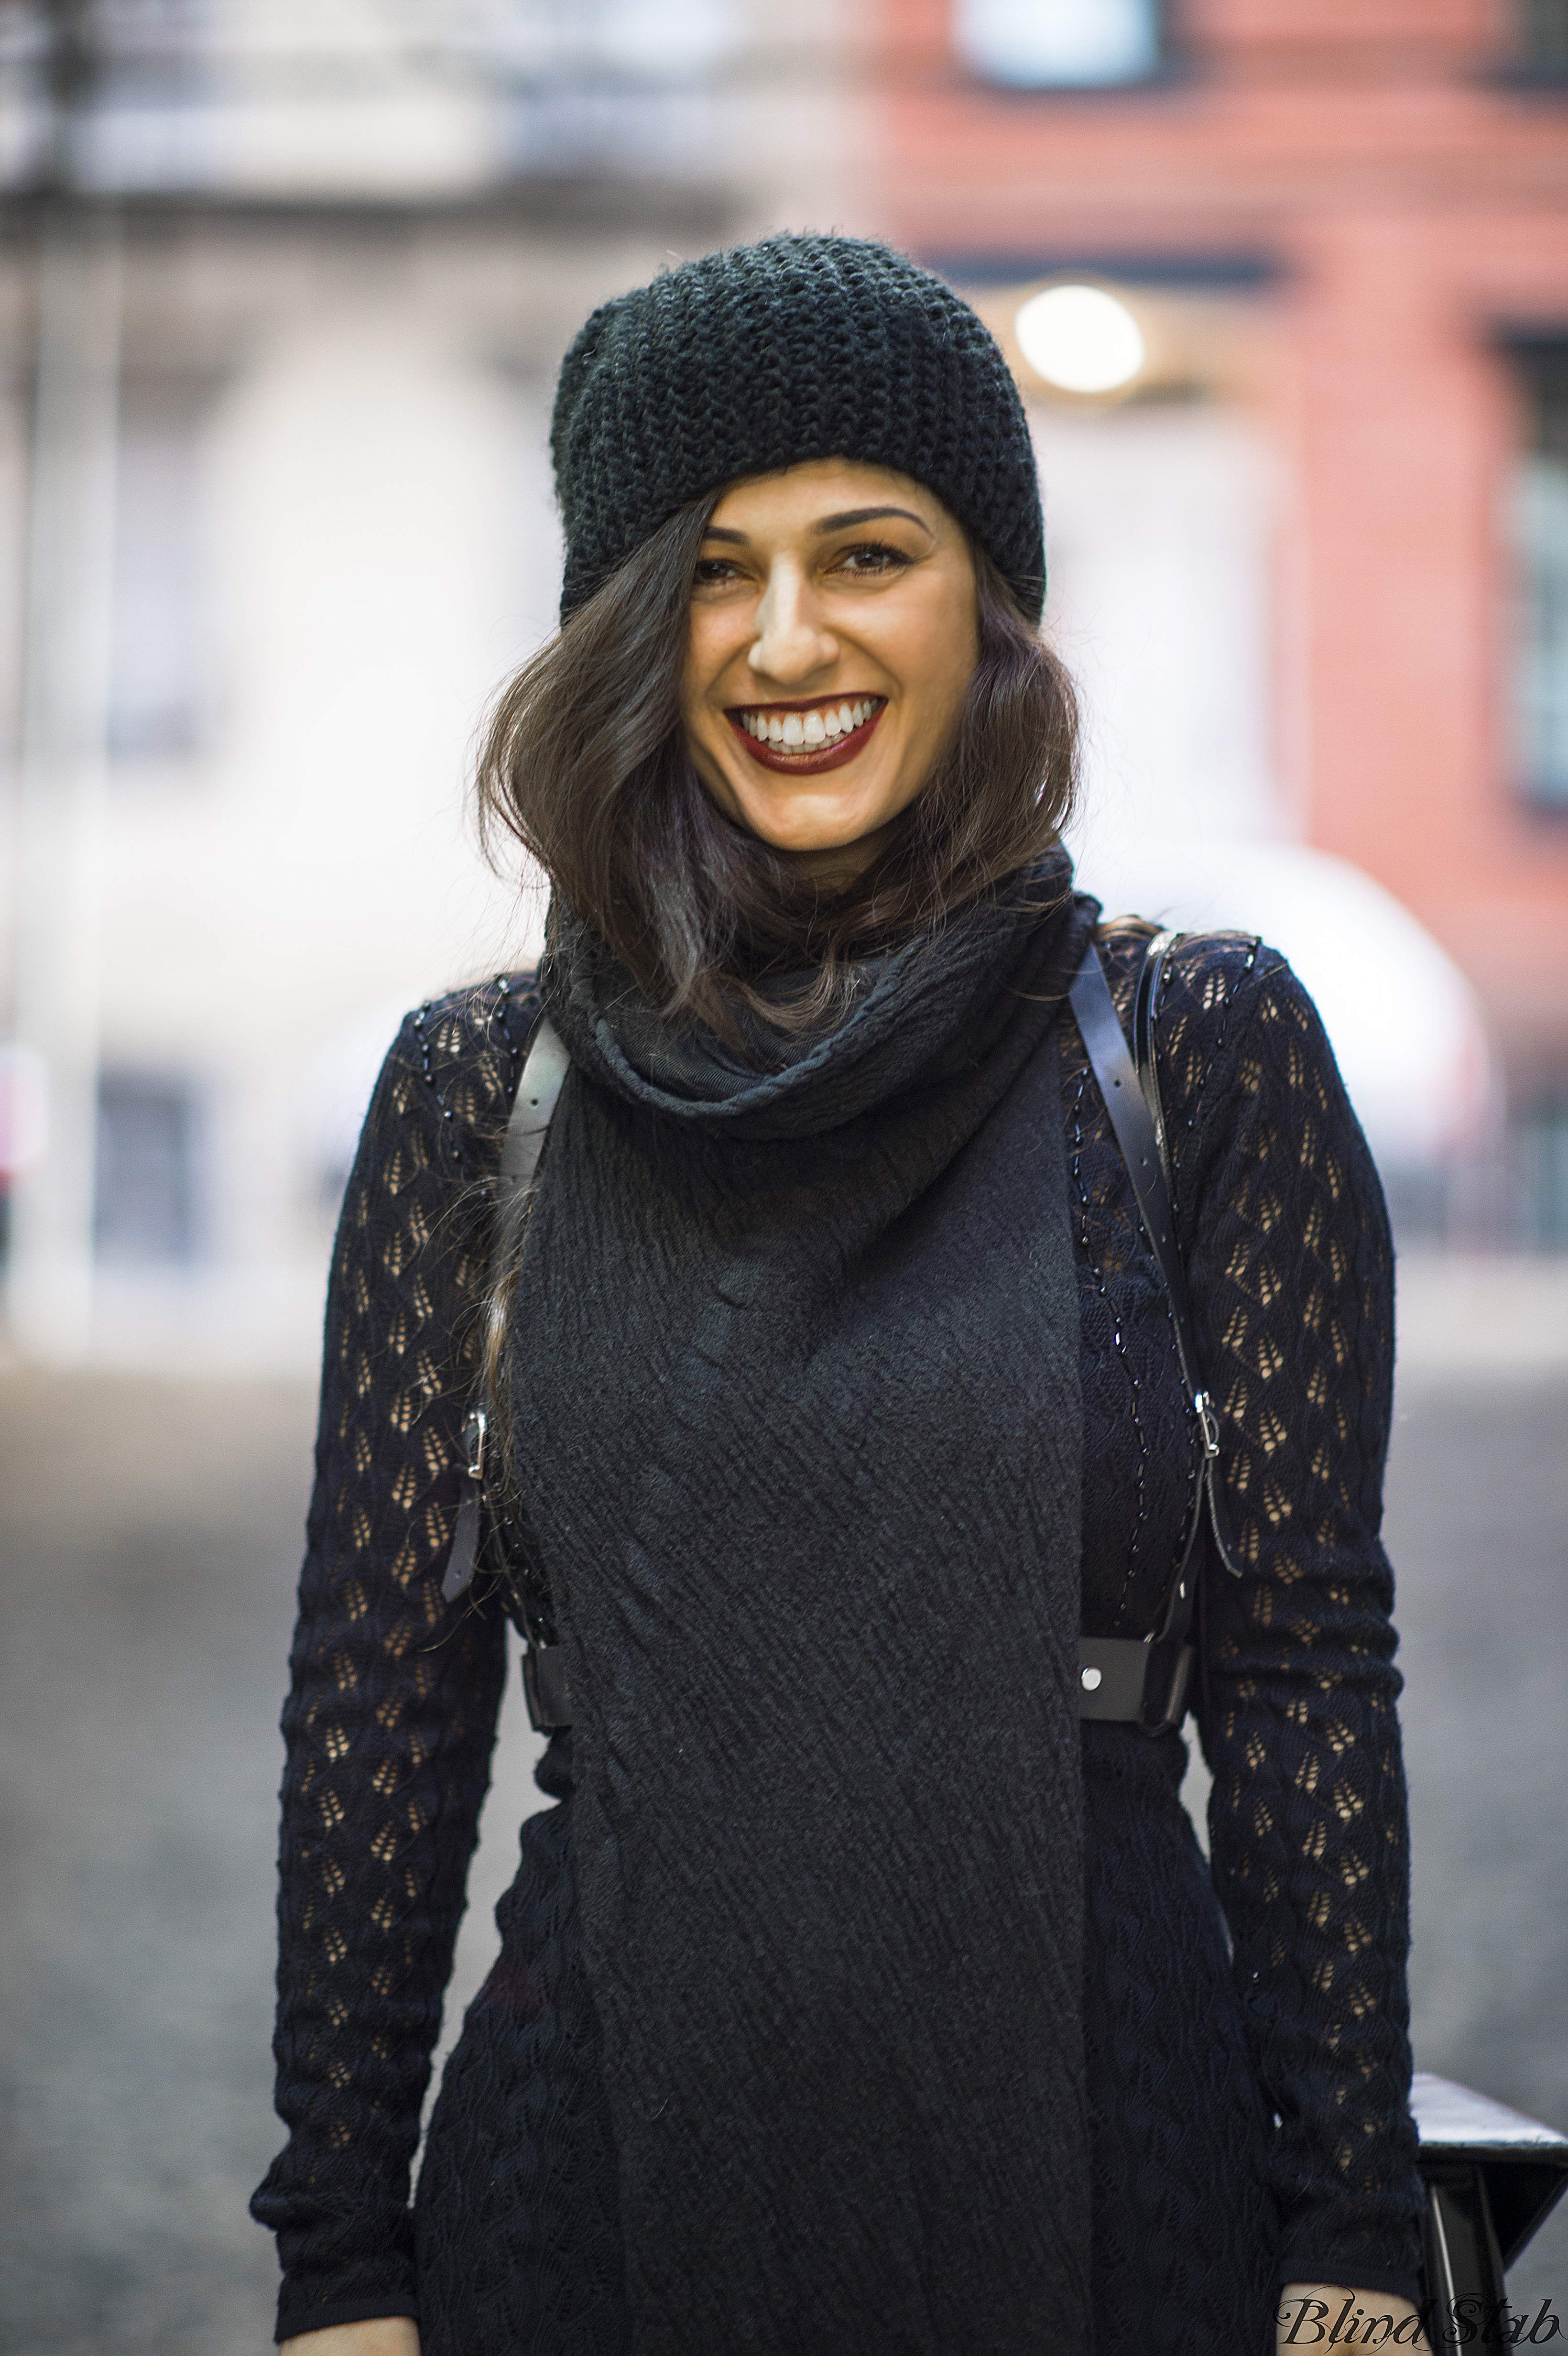 Zana-Bayne-Harness-Curvy-Woman-Black-Maxi-Dress